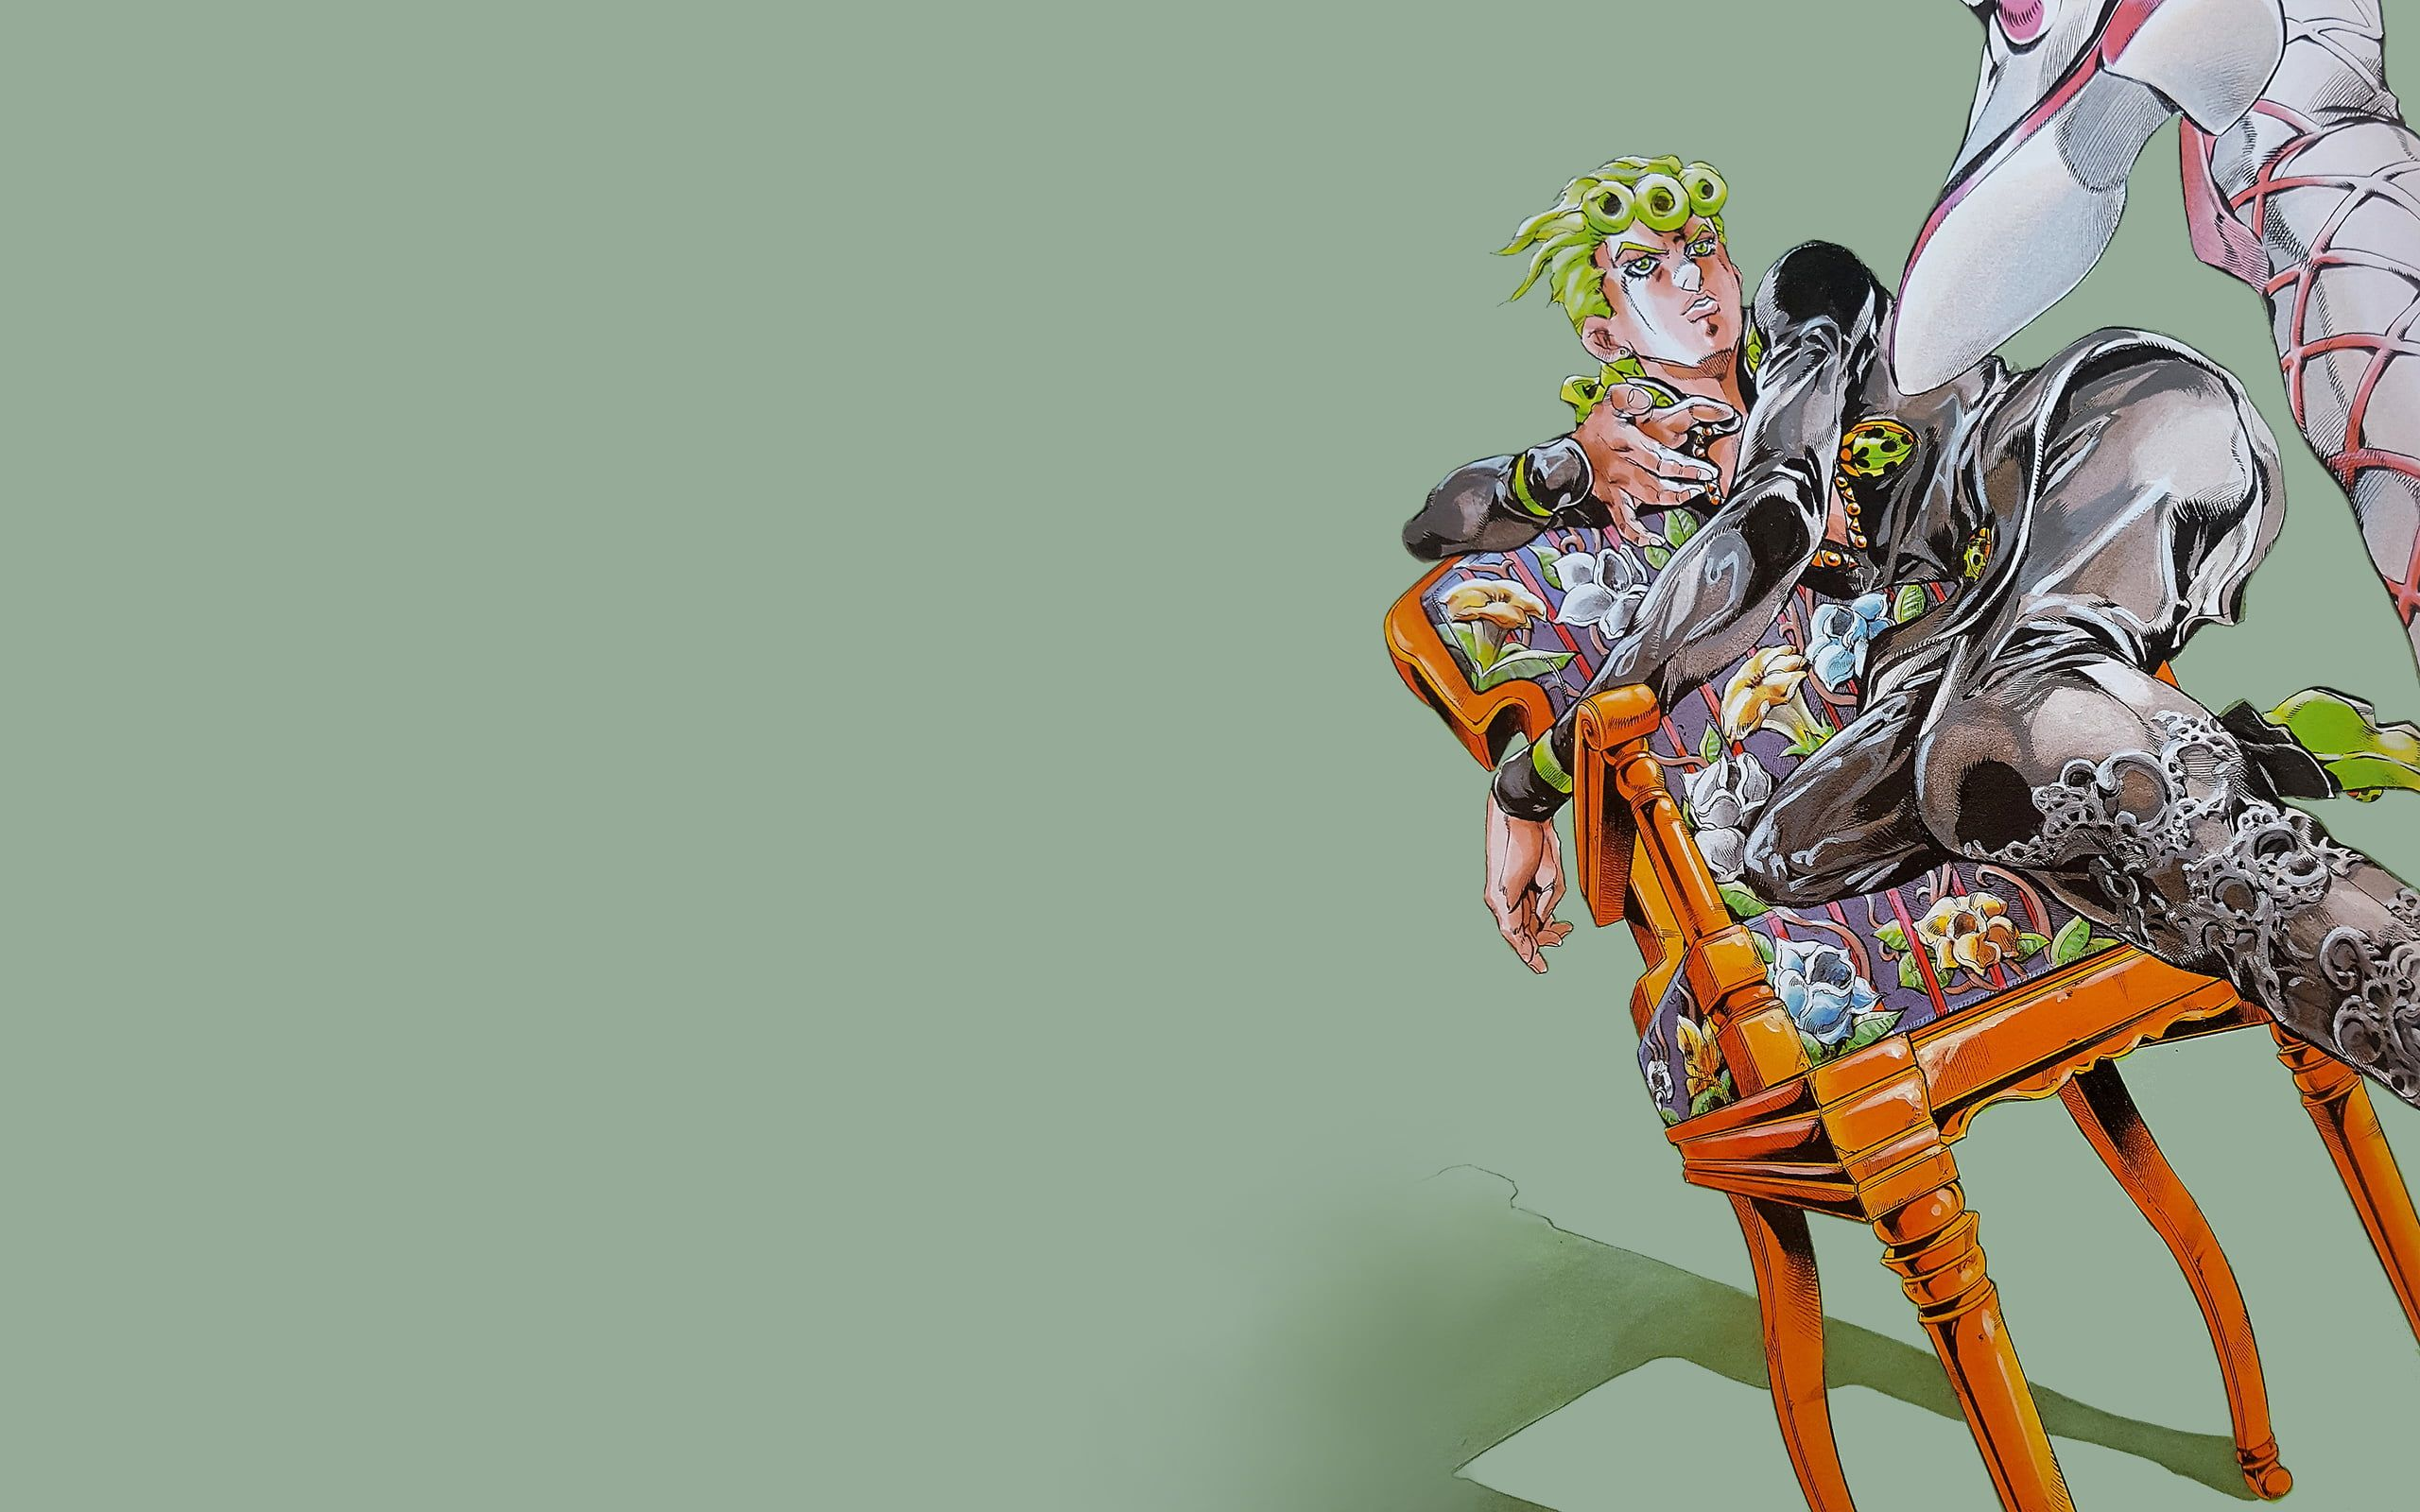 Jojo S Bizarre Adventure Jojolion Anime Manga Hirohiko Araki Jojo S Bizarre Adventure Golden Wind Vento Aureo In 2020 Jojo S Bizarre Adventure Jojo Bizarre Bizarre